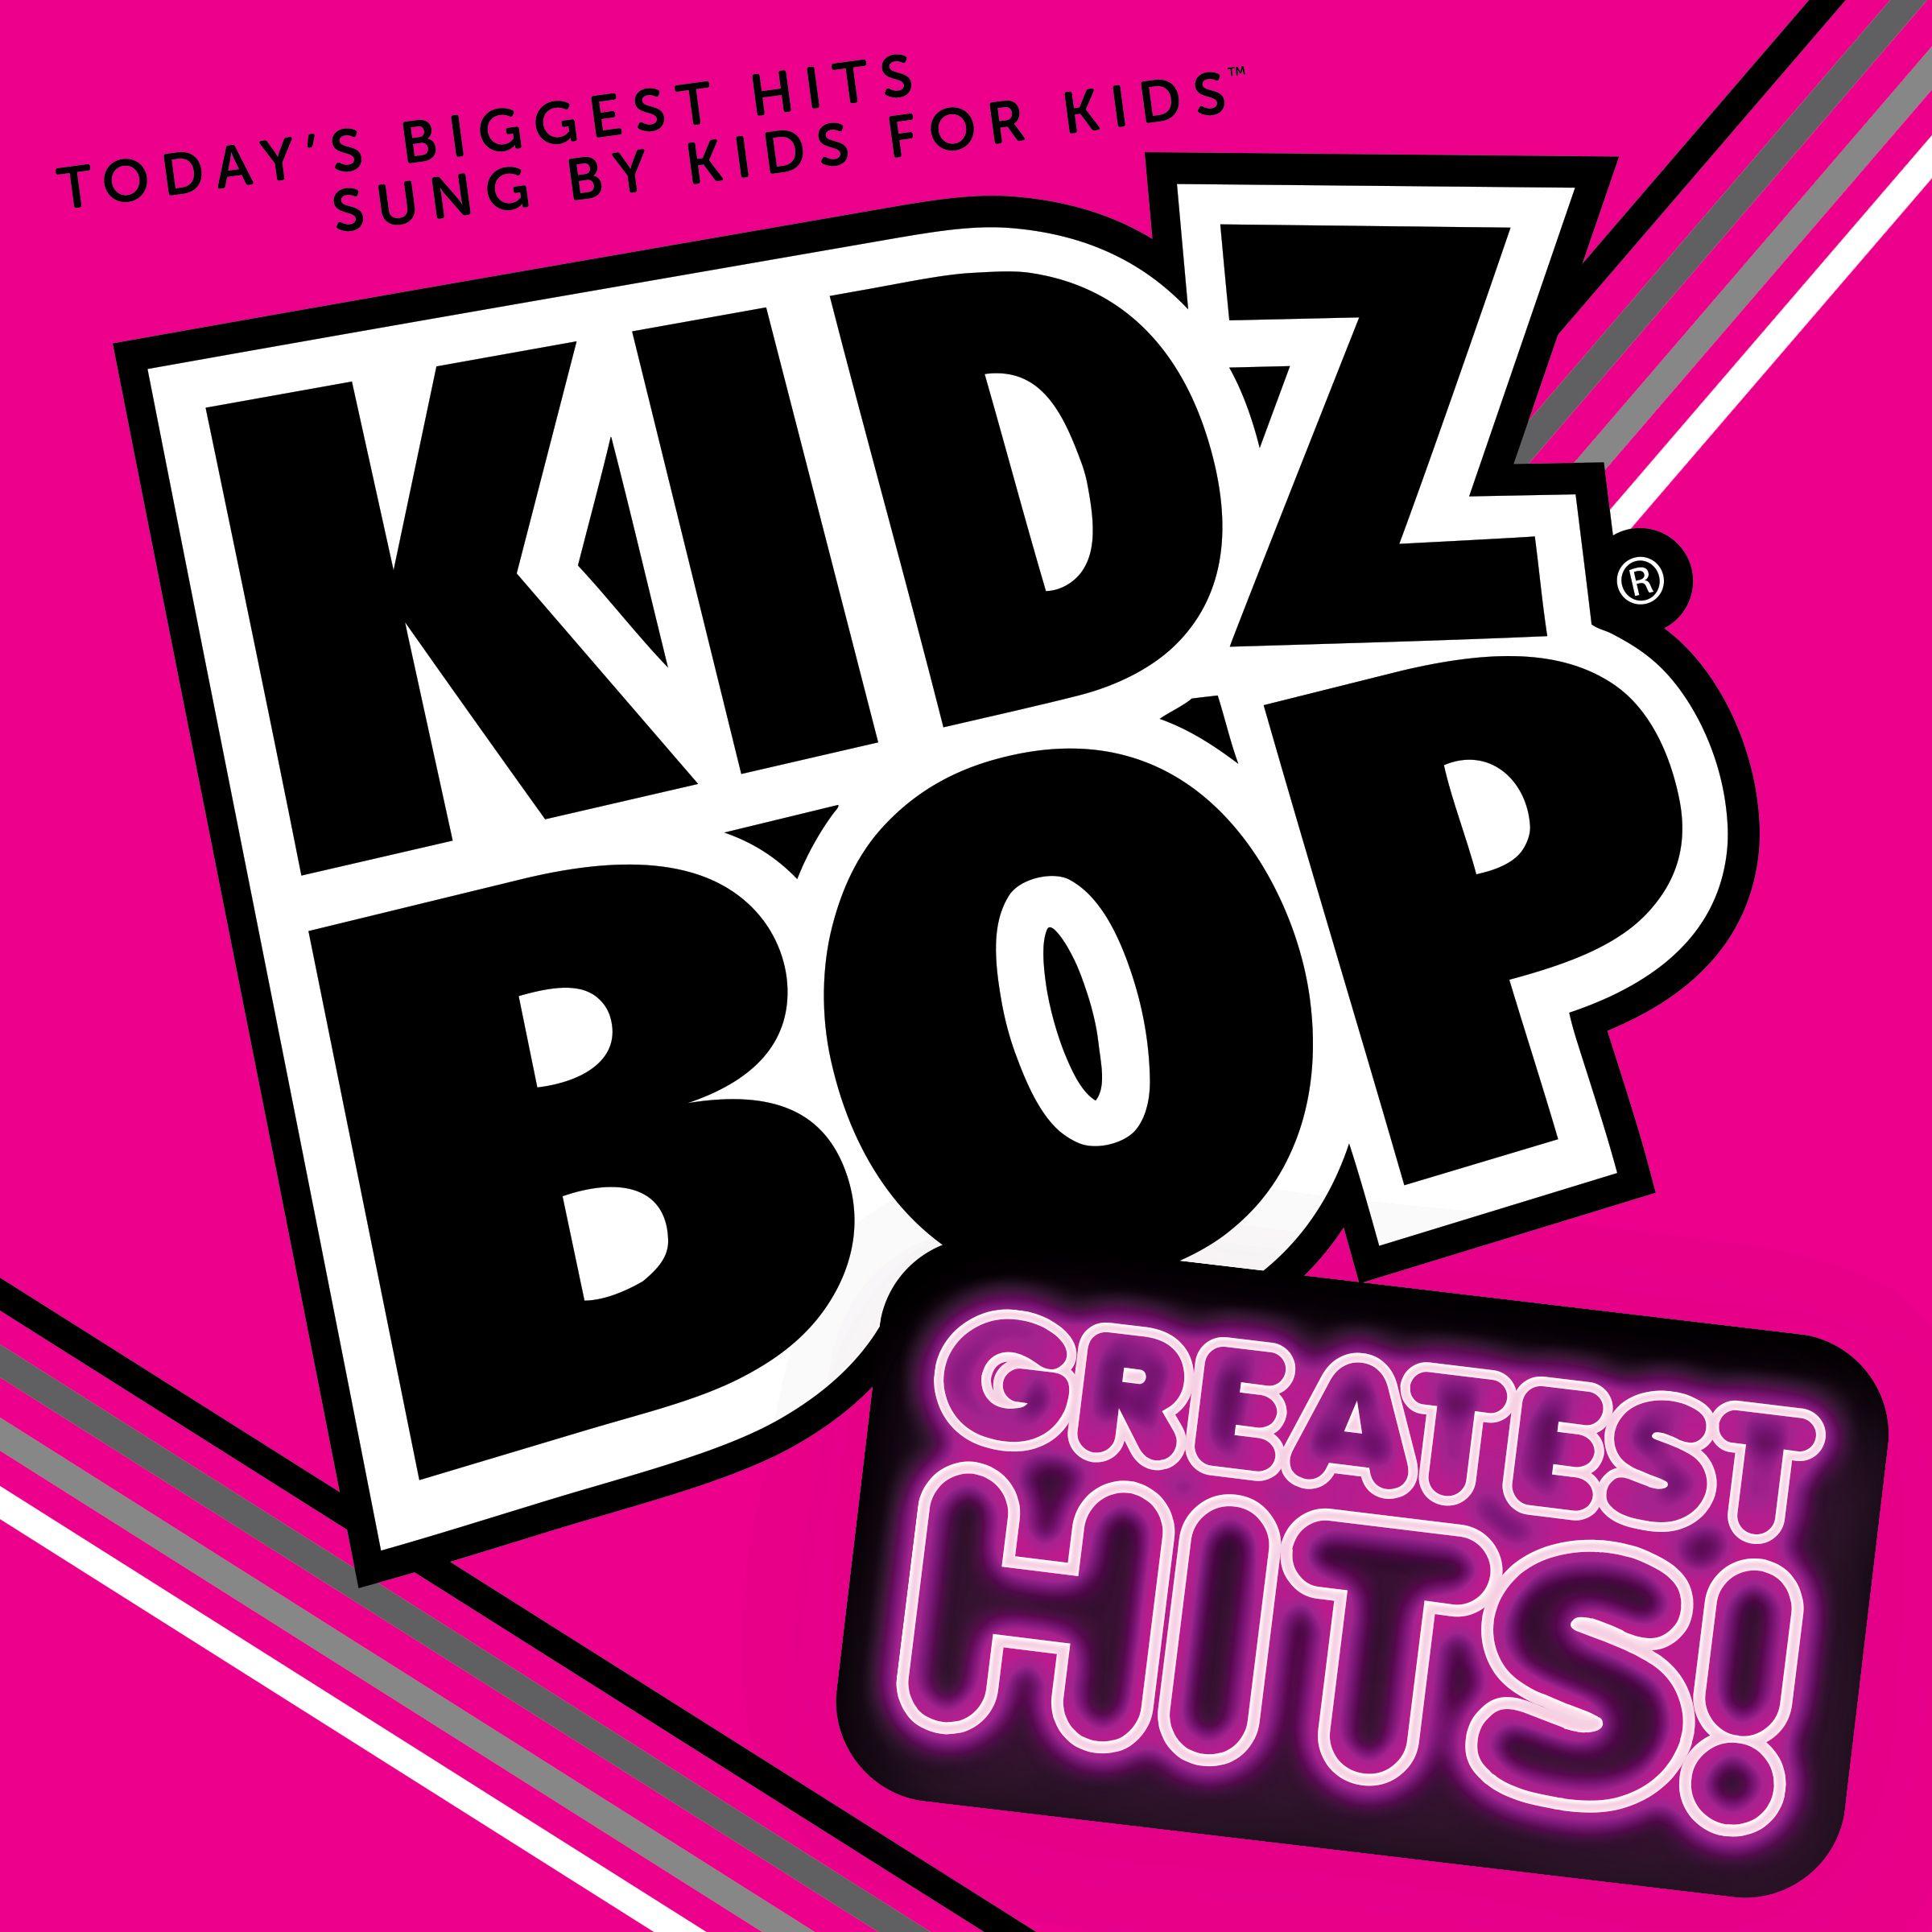 download: #KIDZBOP Greatest Hits!.